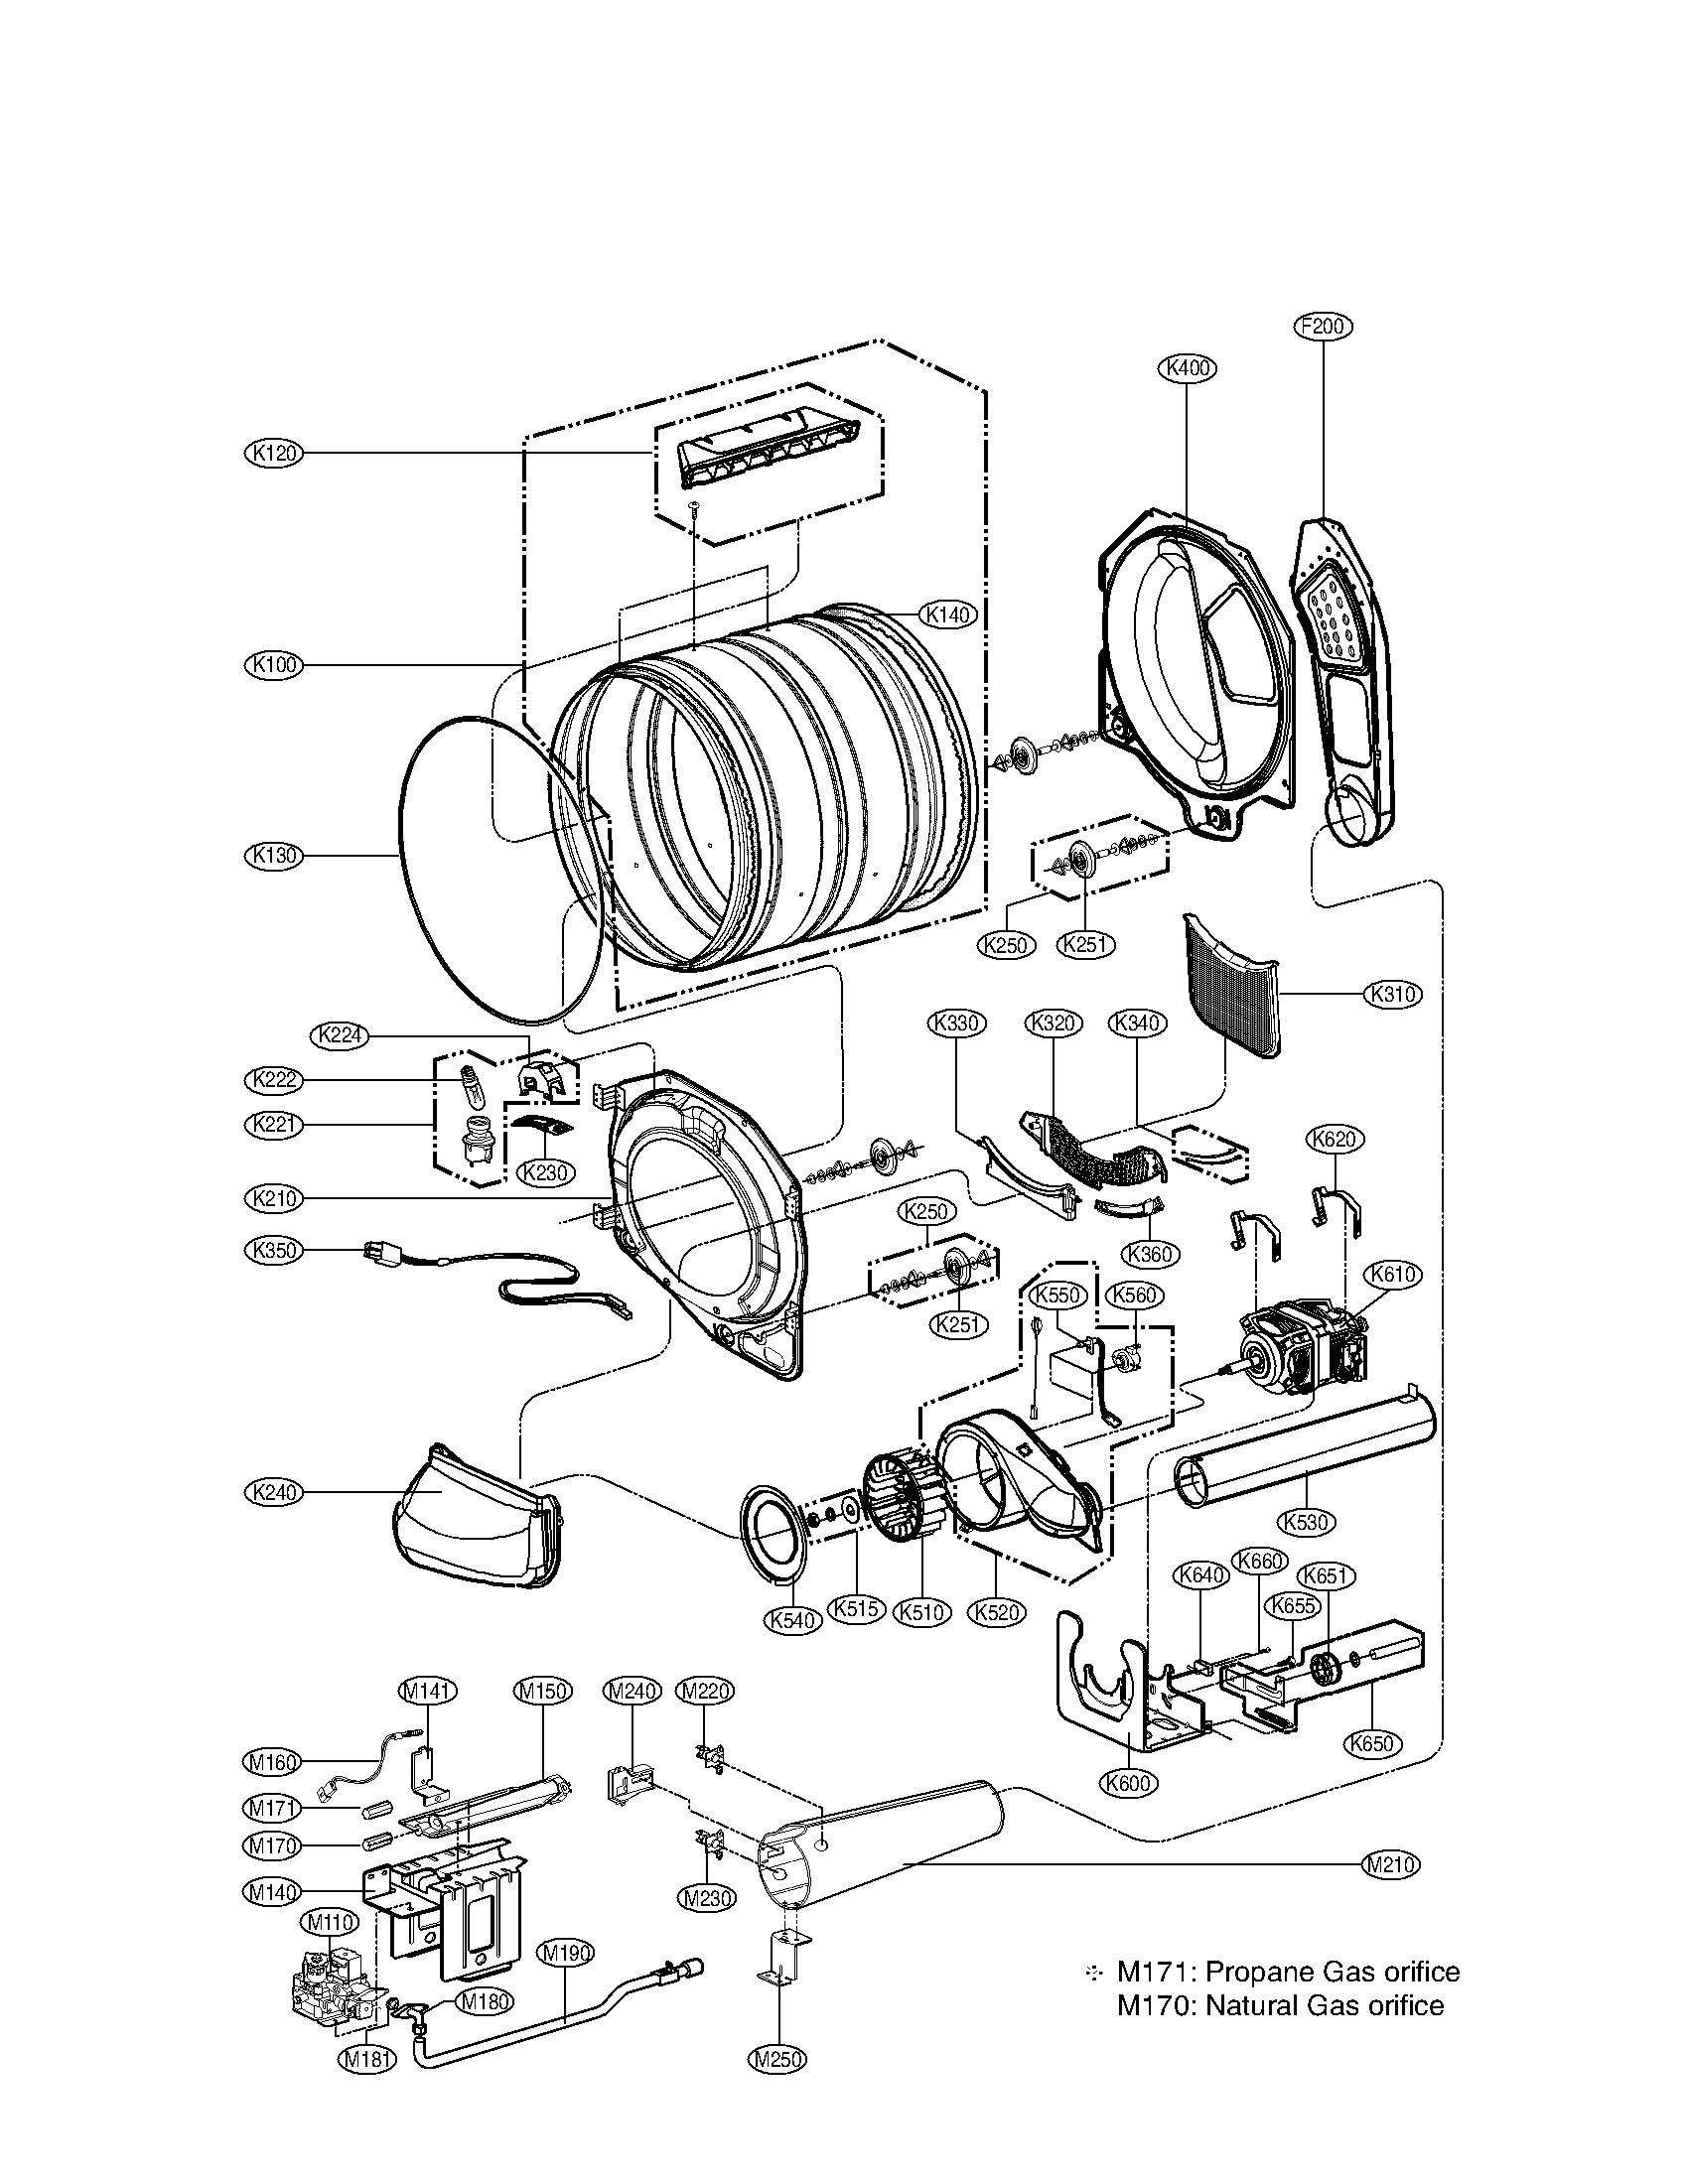 Maytag Dryer Wiring Diagram Ade3srgs173tw01. . Wiring Diagram on